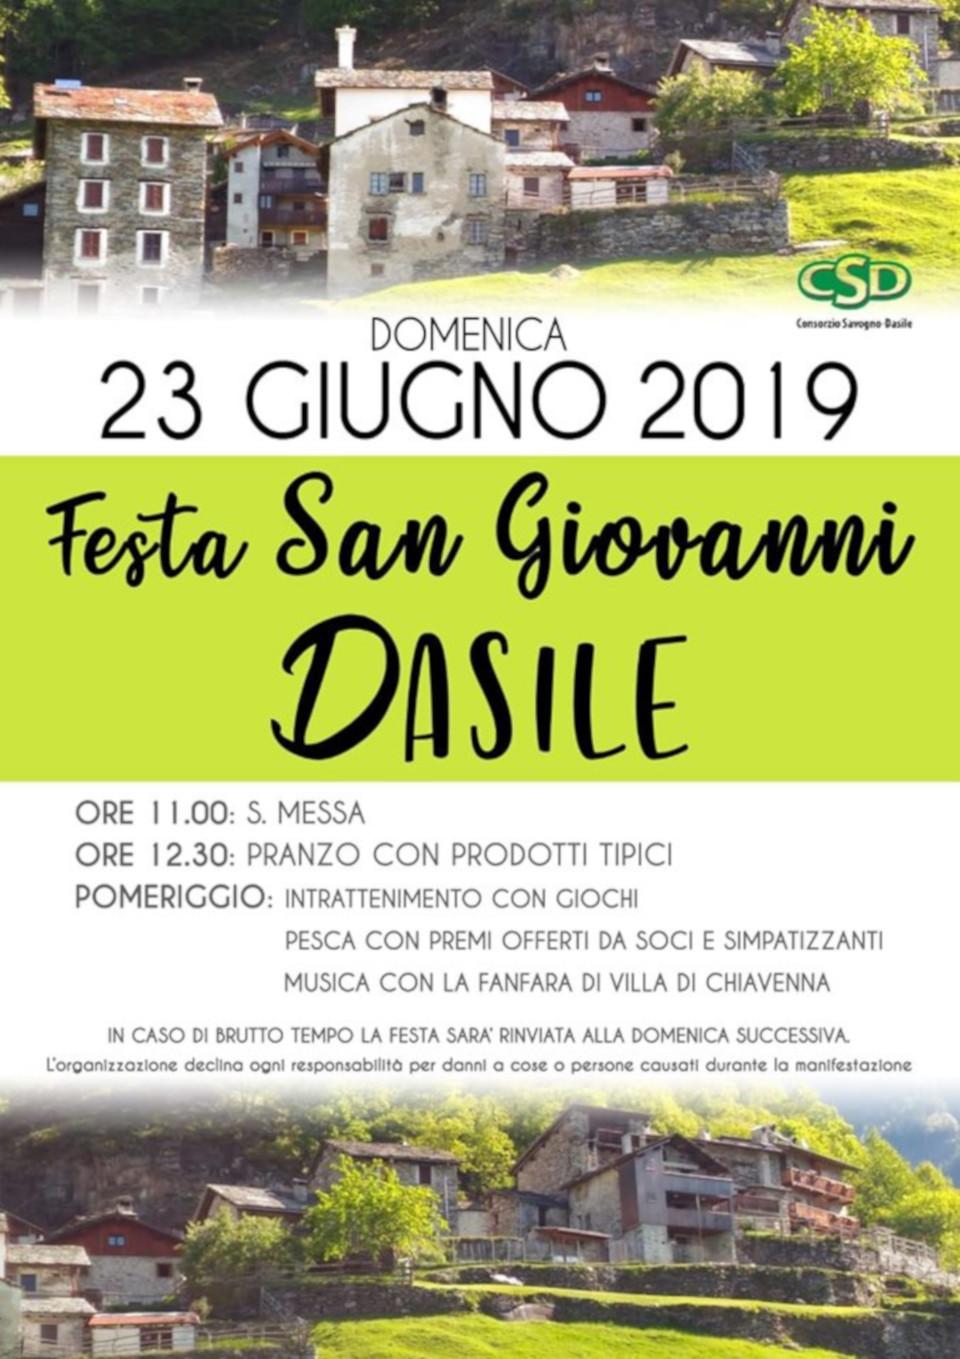 Festa San Giovanni a Dasile